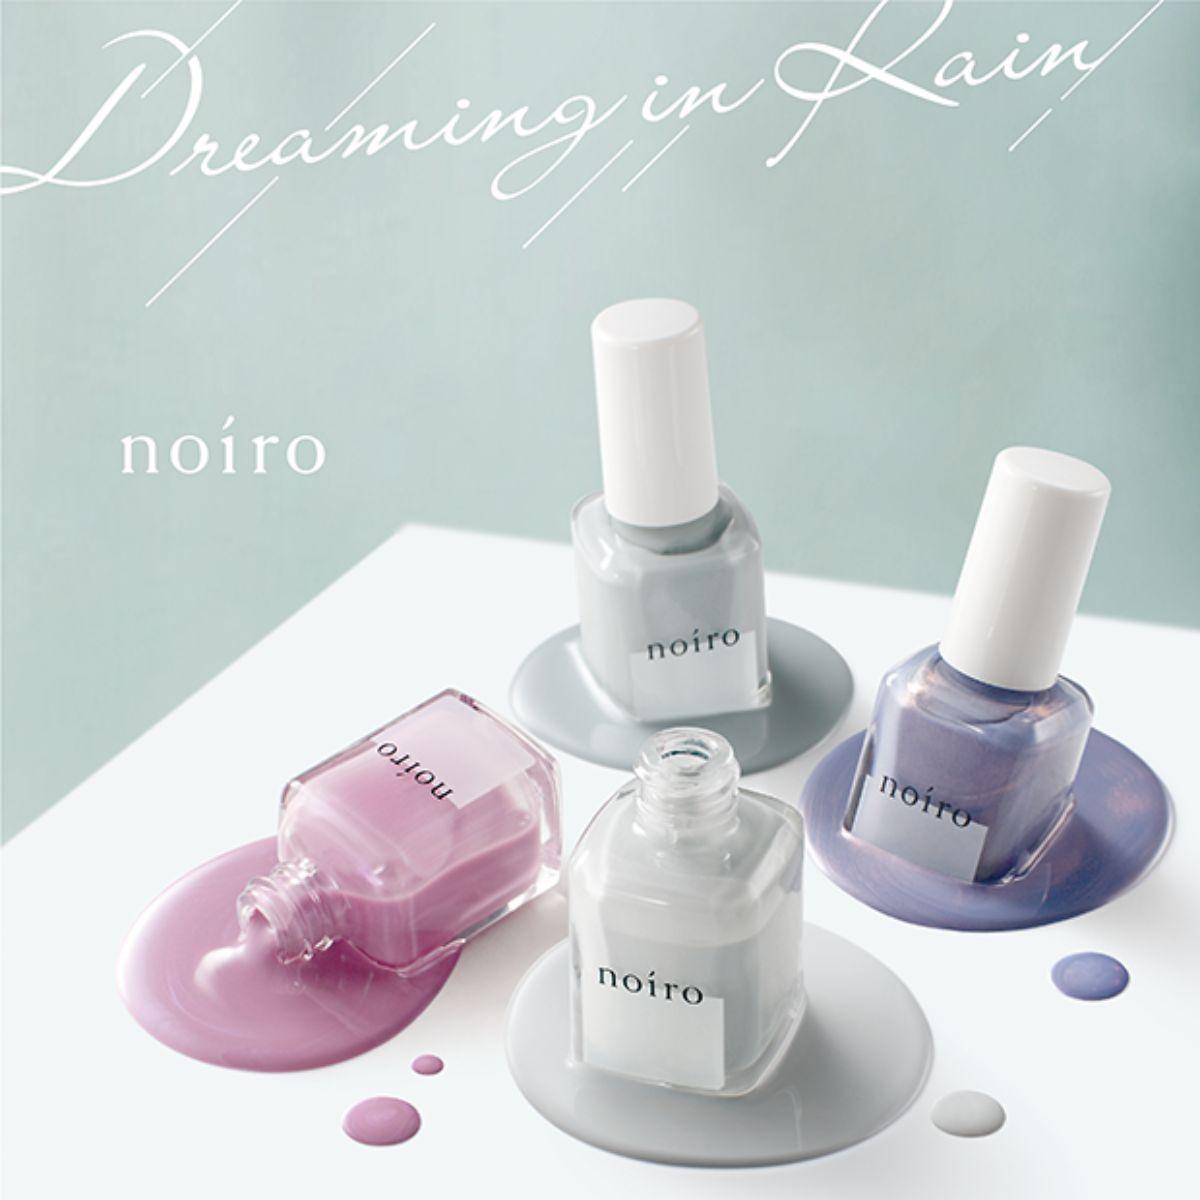 noiro ノイロ ネイルカラー 11ml Dreaming in Rain 爪に 優しい マニキュア セルフネイル パール 指先 手 きれい ナチュラル ポリッシュ s023 s024 s025 s026